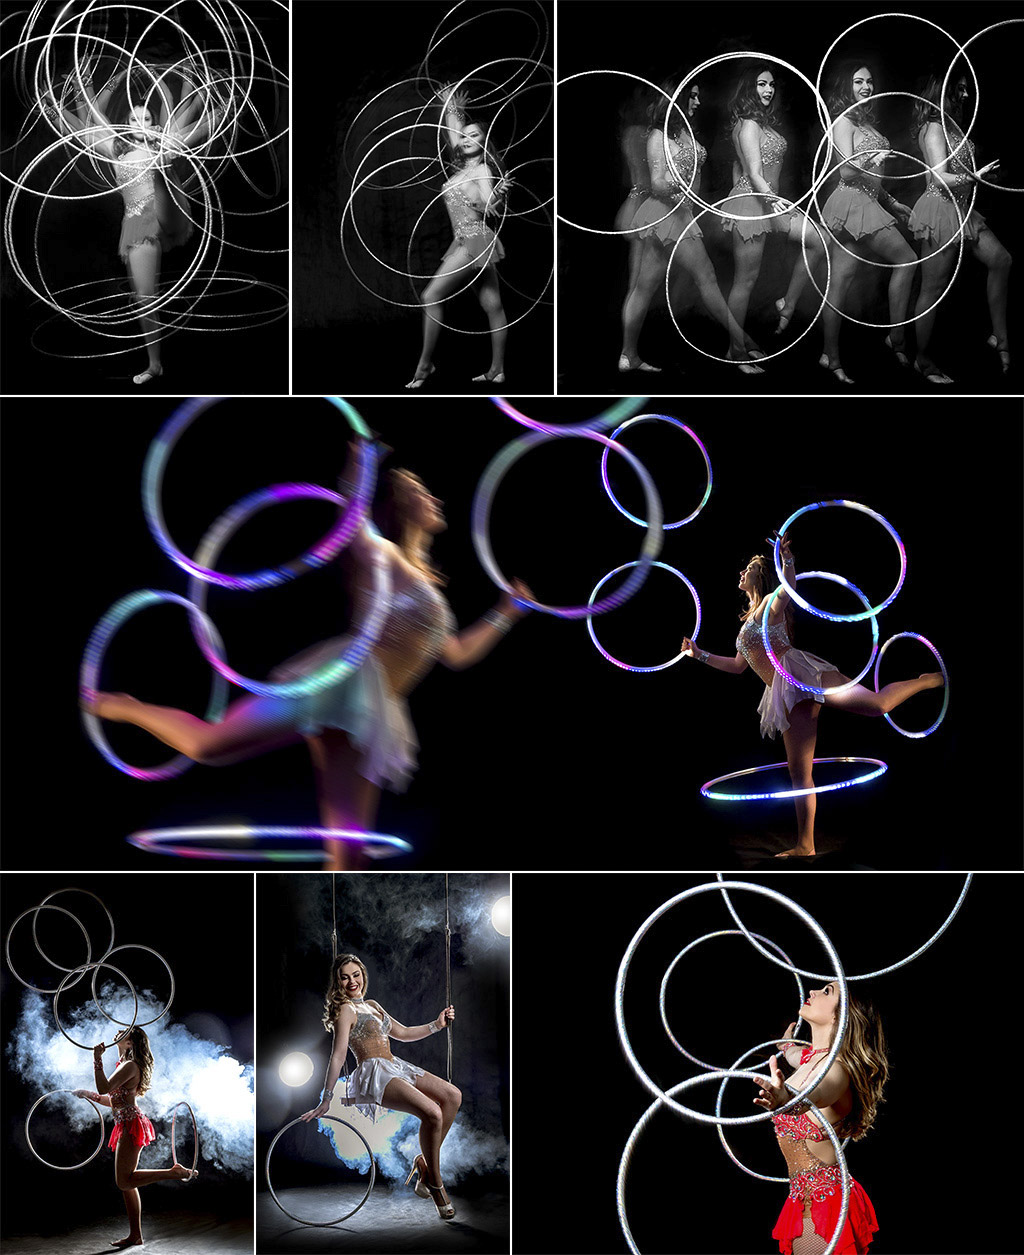 fotodesign ilona voss fotografie photography art kunst kreativ zirkus circus roncalli reifen acrobatic geraldine philadelphia